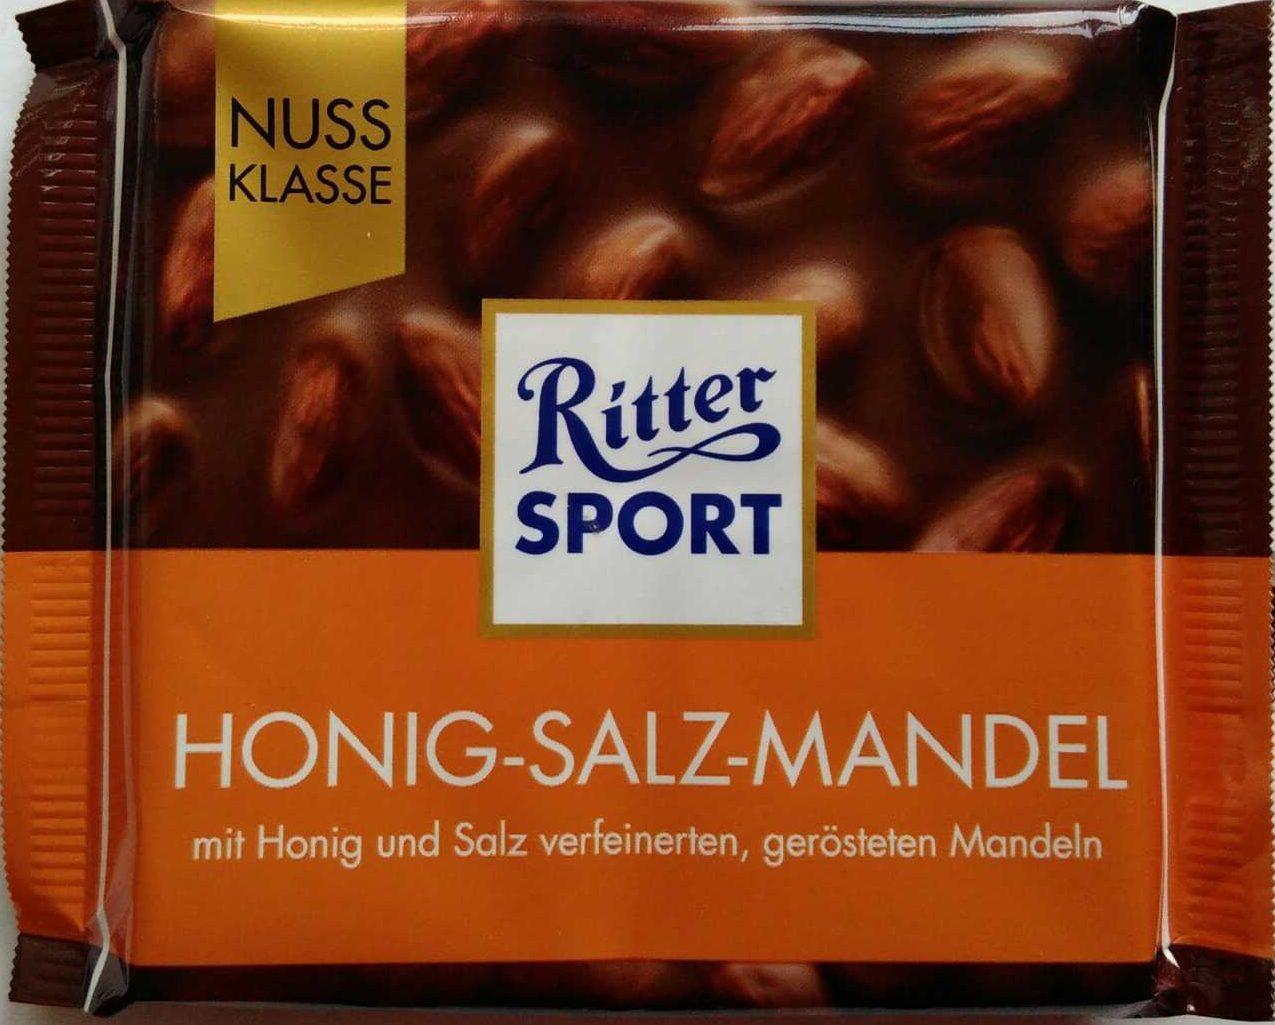 Honig-Salz-Mandel - Produkt - de